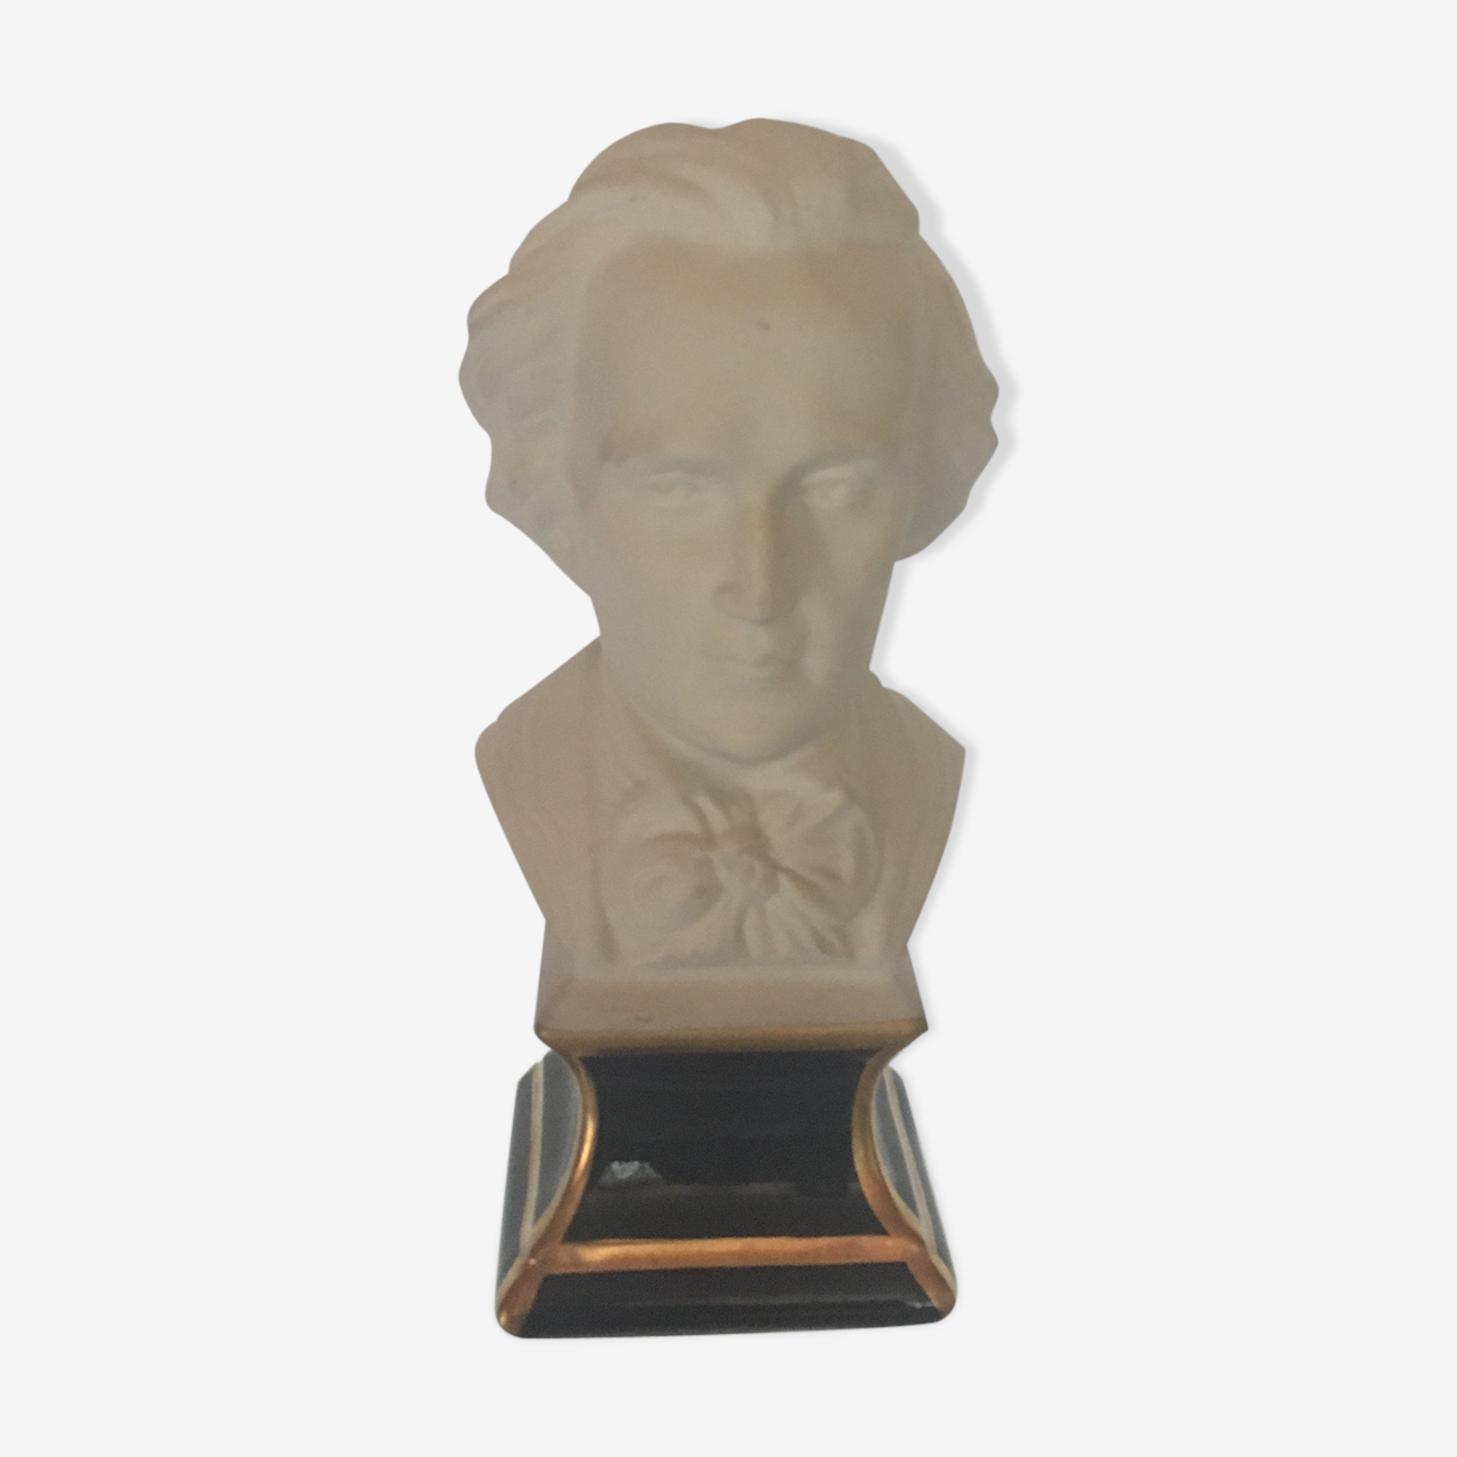 Buste Frédéric François Chopin, Tharaud Limoges